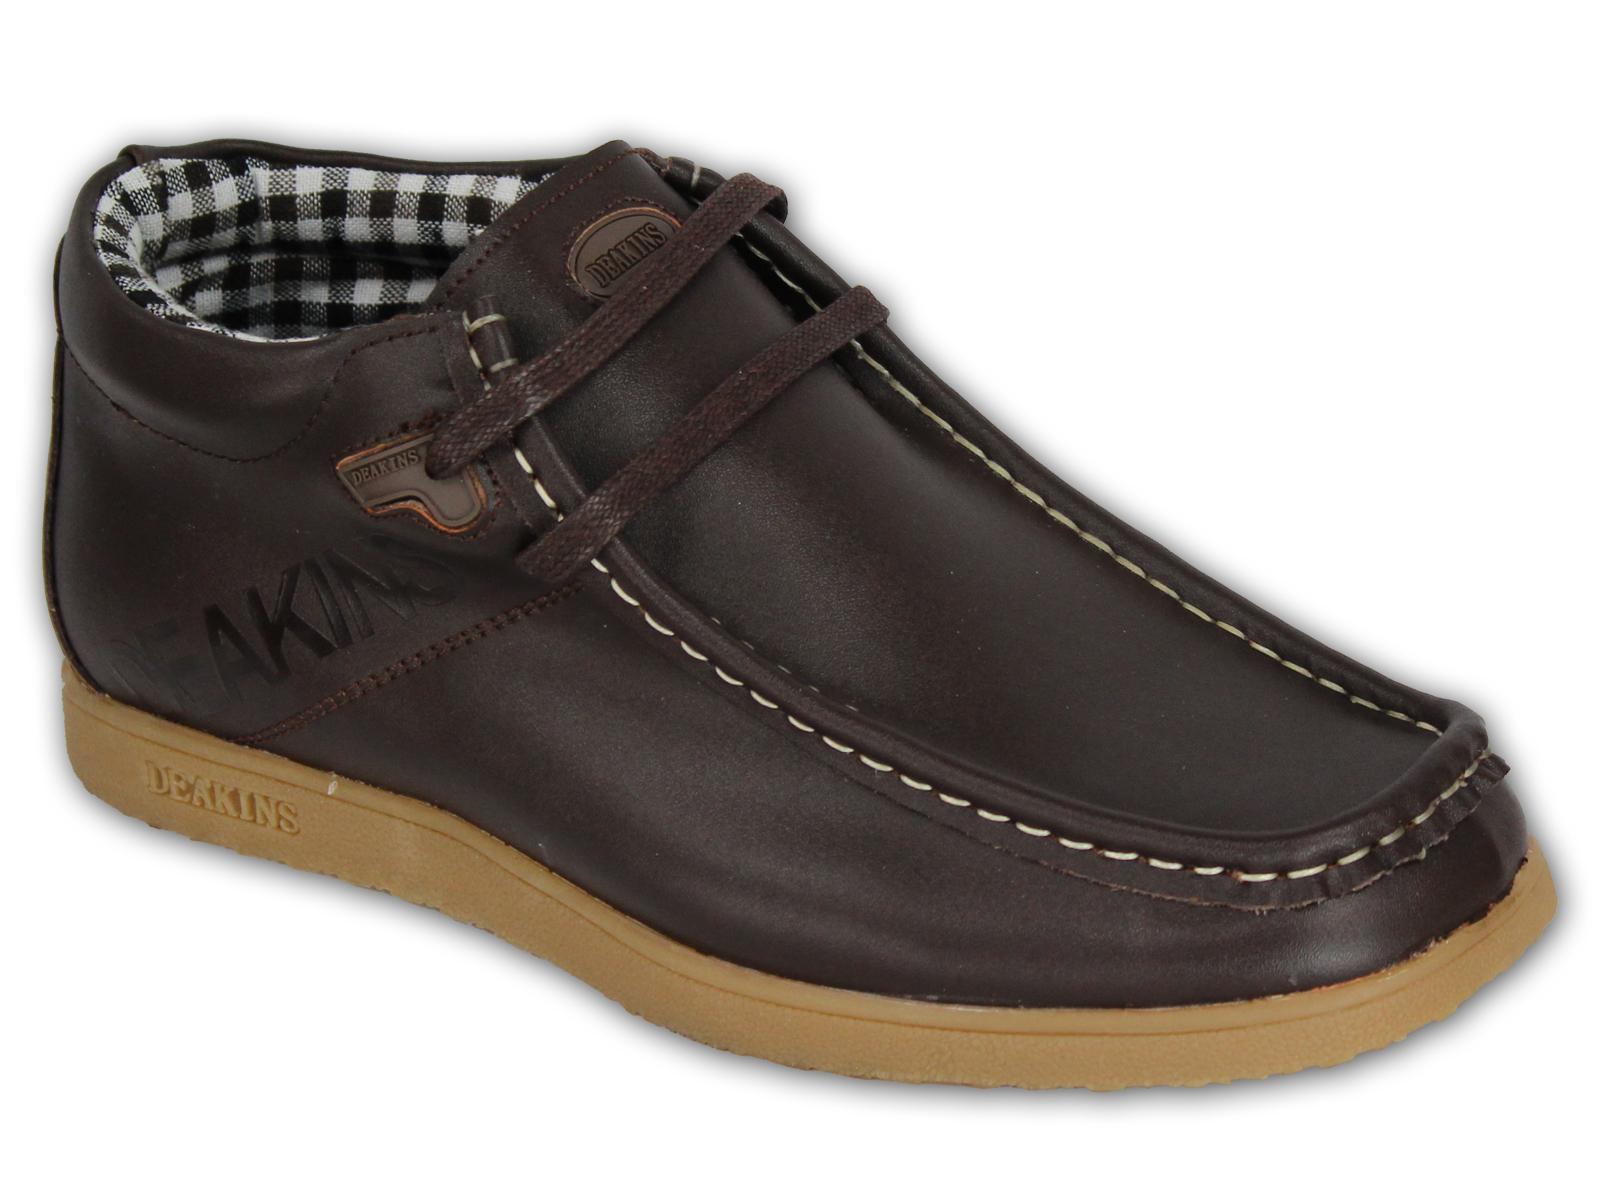 designer school shoes 28 images popular school shoes